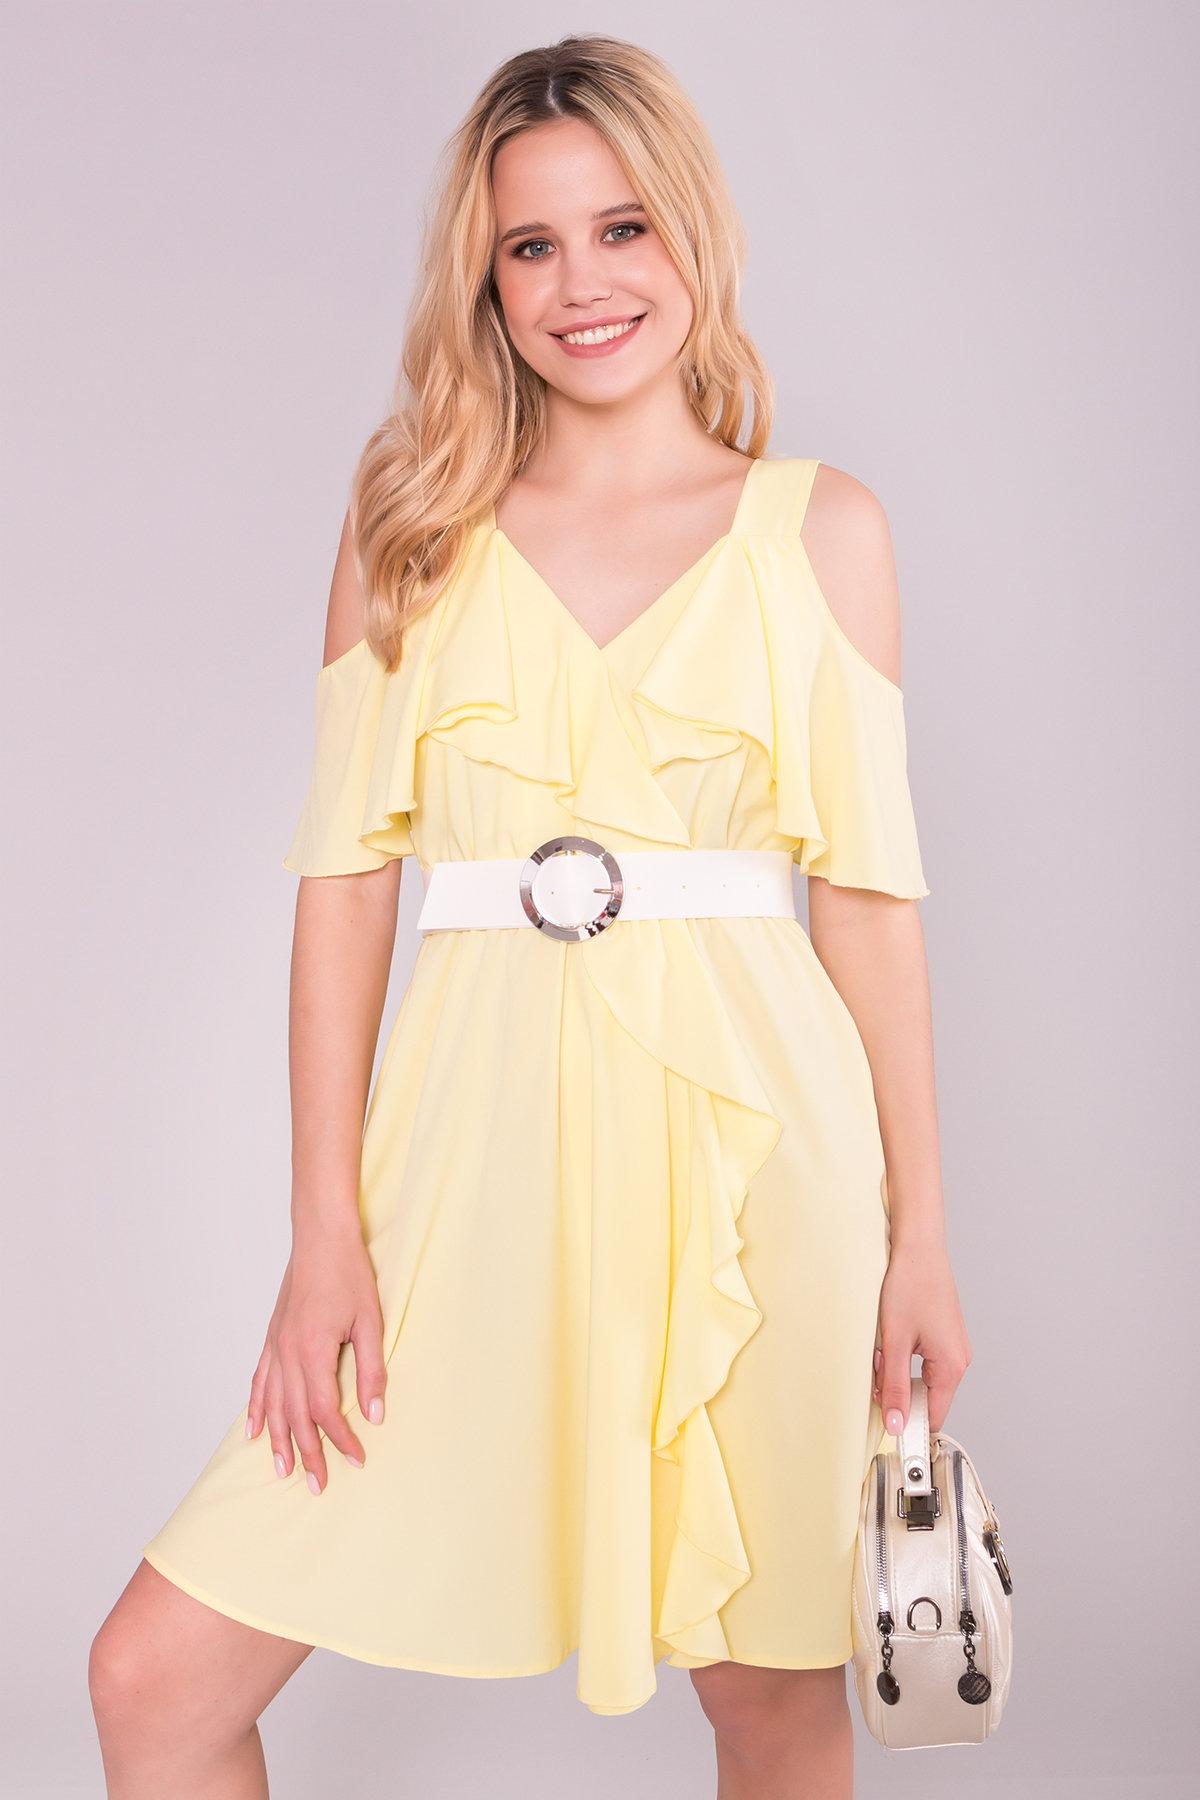 Платье Нуара 7358 АРТ. 43101 Цвет: Желтый - фото 3, интернет магазин tm-modus.ru